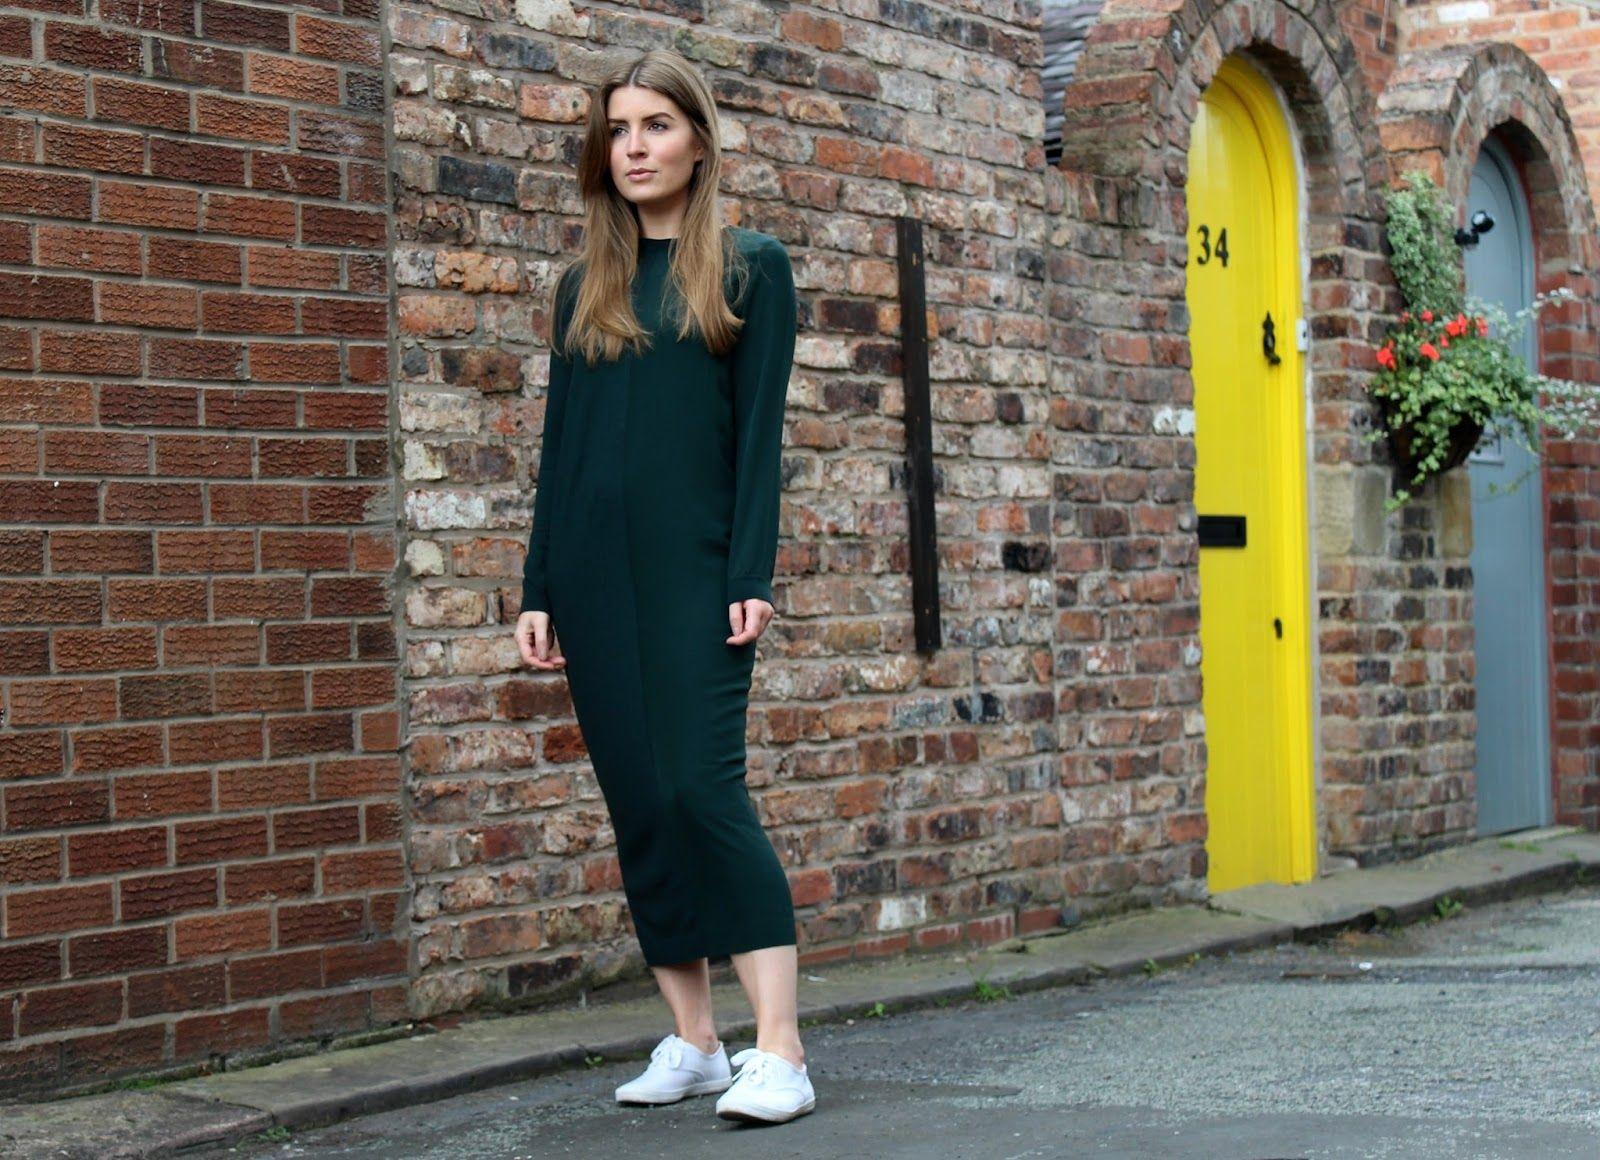 Green midi dress and Keds